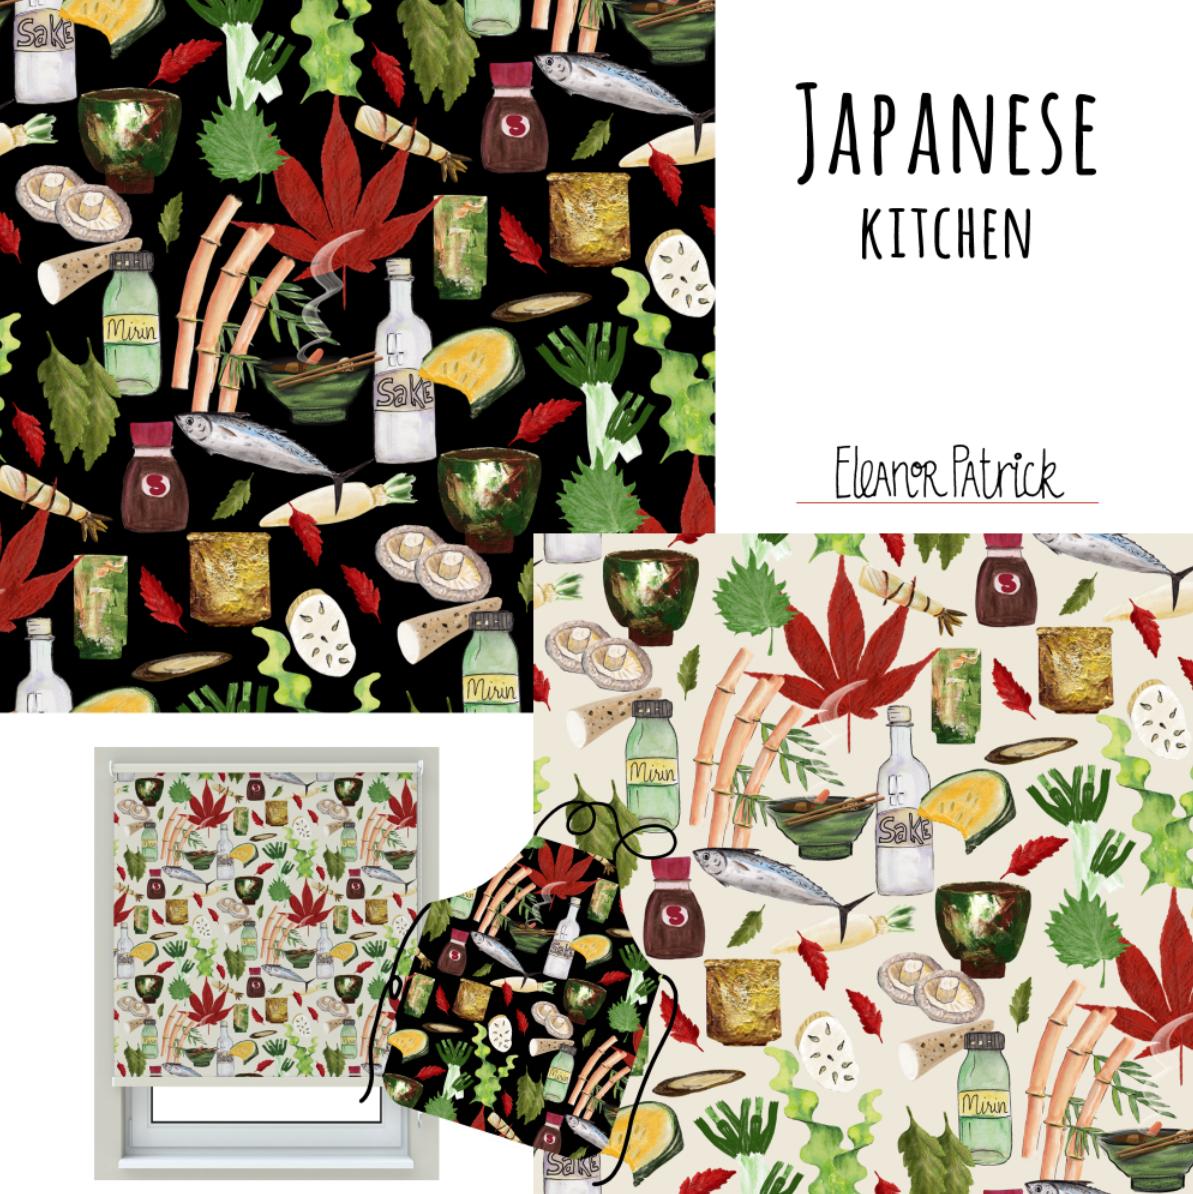 Japanese kitchen samples